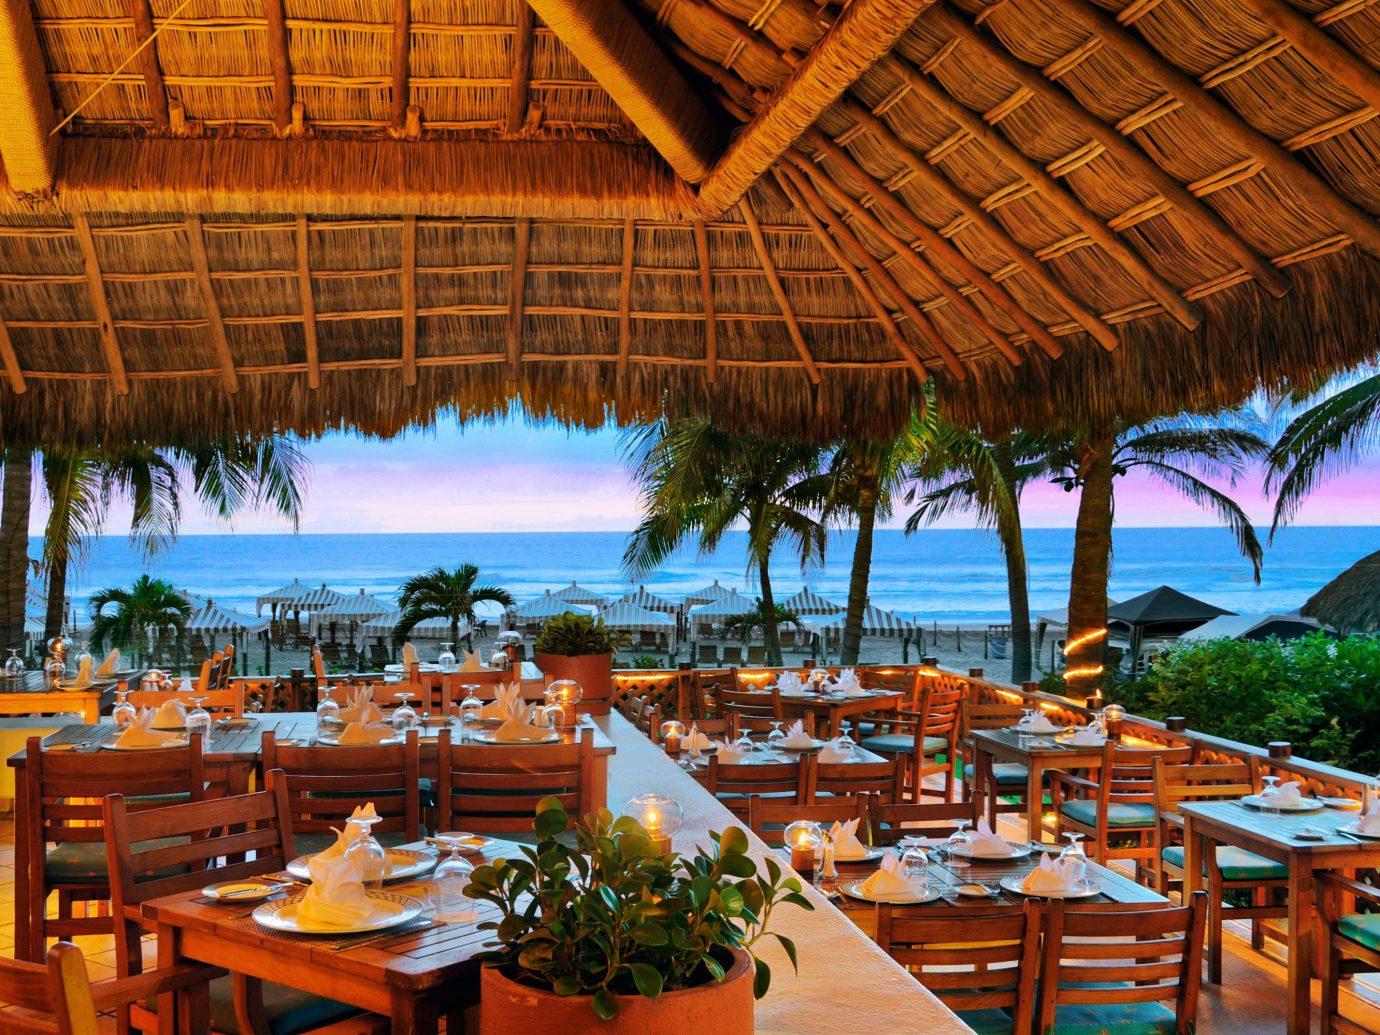 Budget table umbrella outdoor chair Resort restaurant vacation estate meal Dining caribbean set several dining room